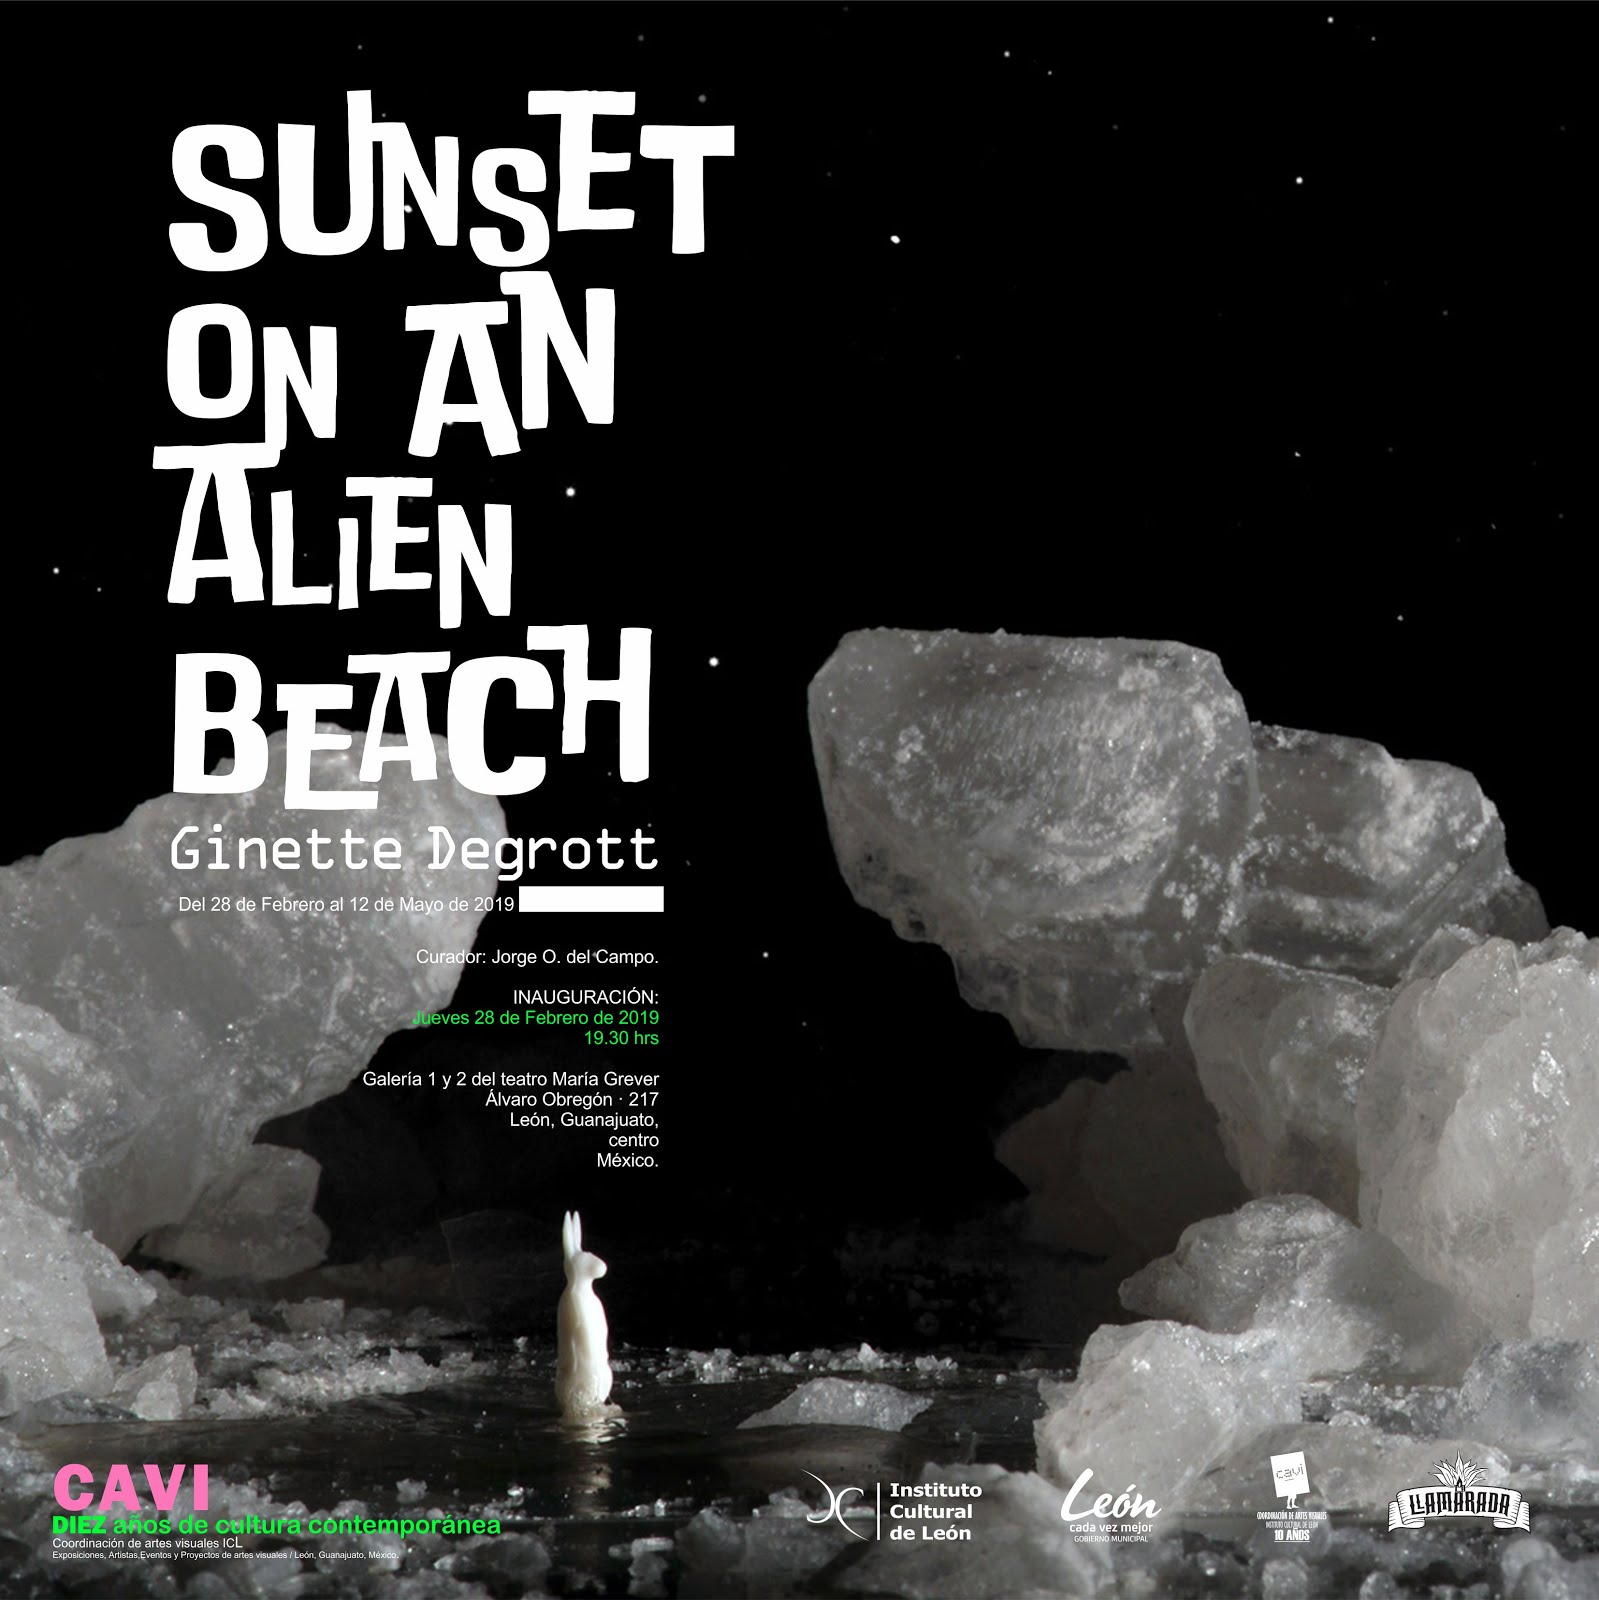 Sunset on an alien beach.